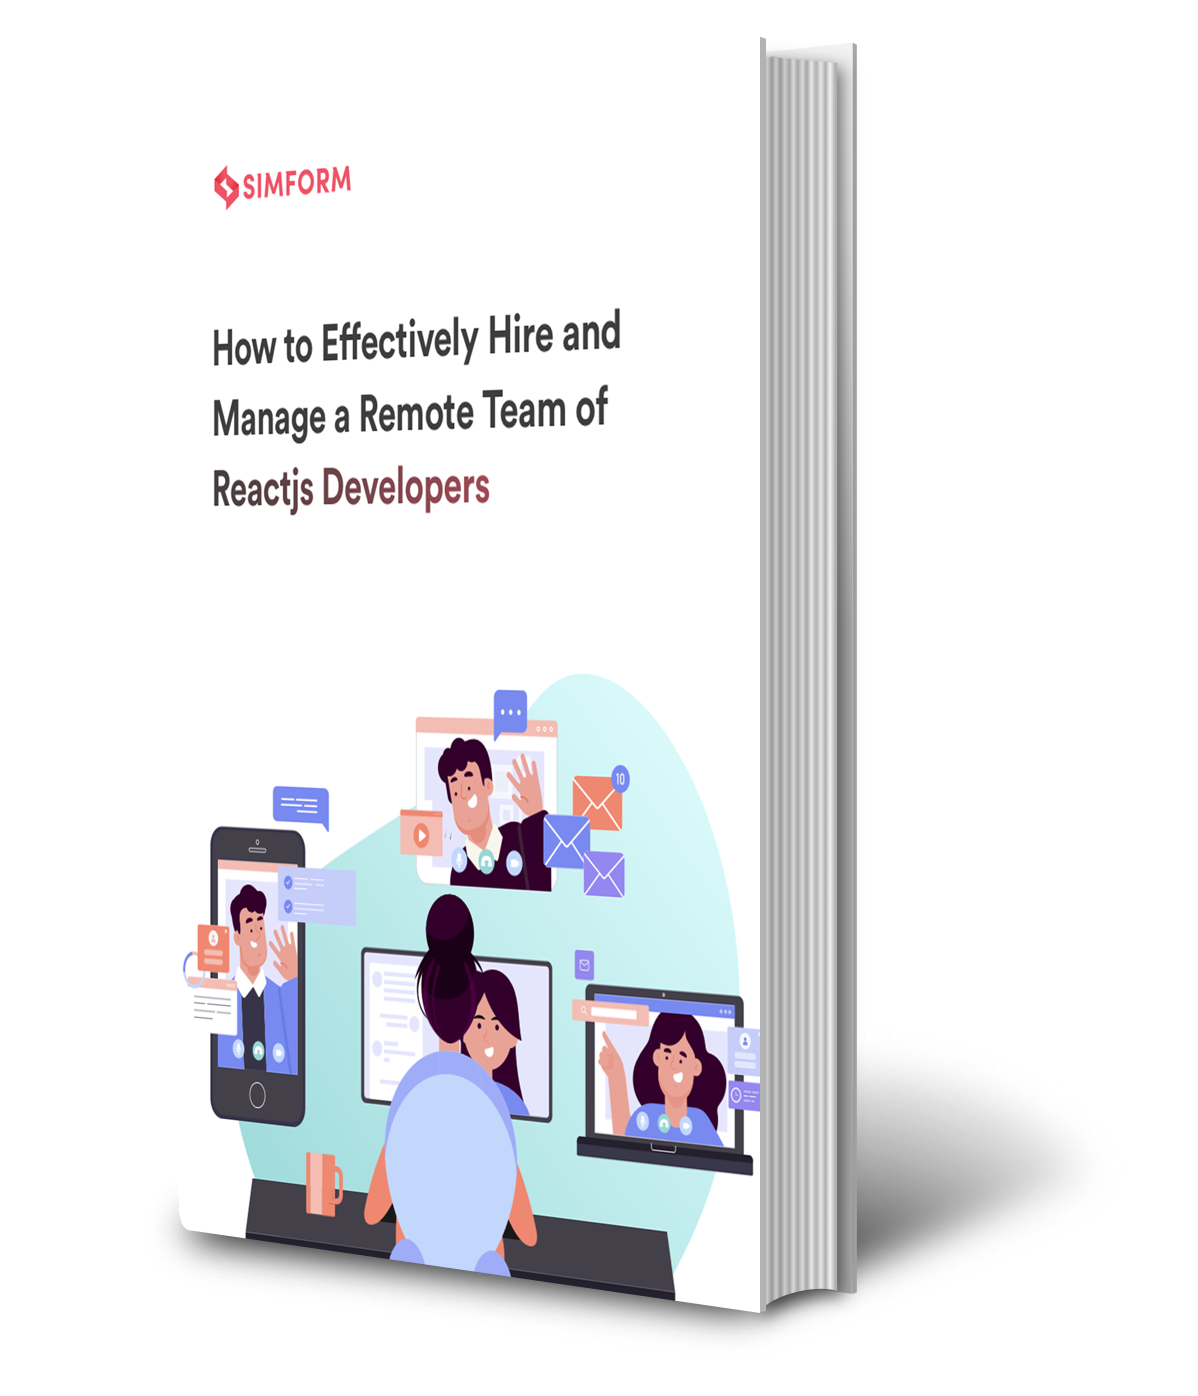 How hire remote reactjs developers Ebook Mockup